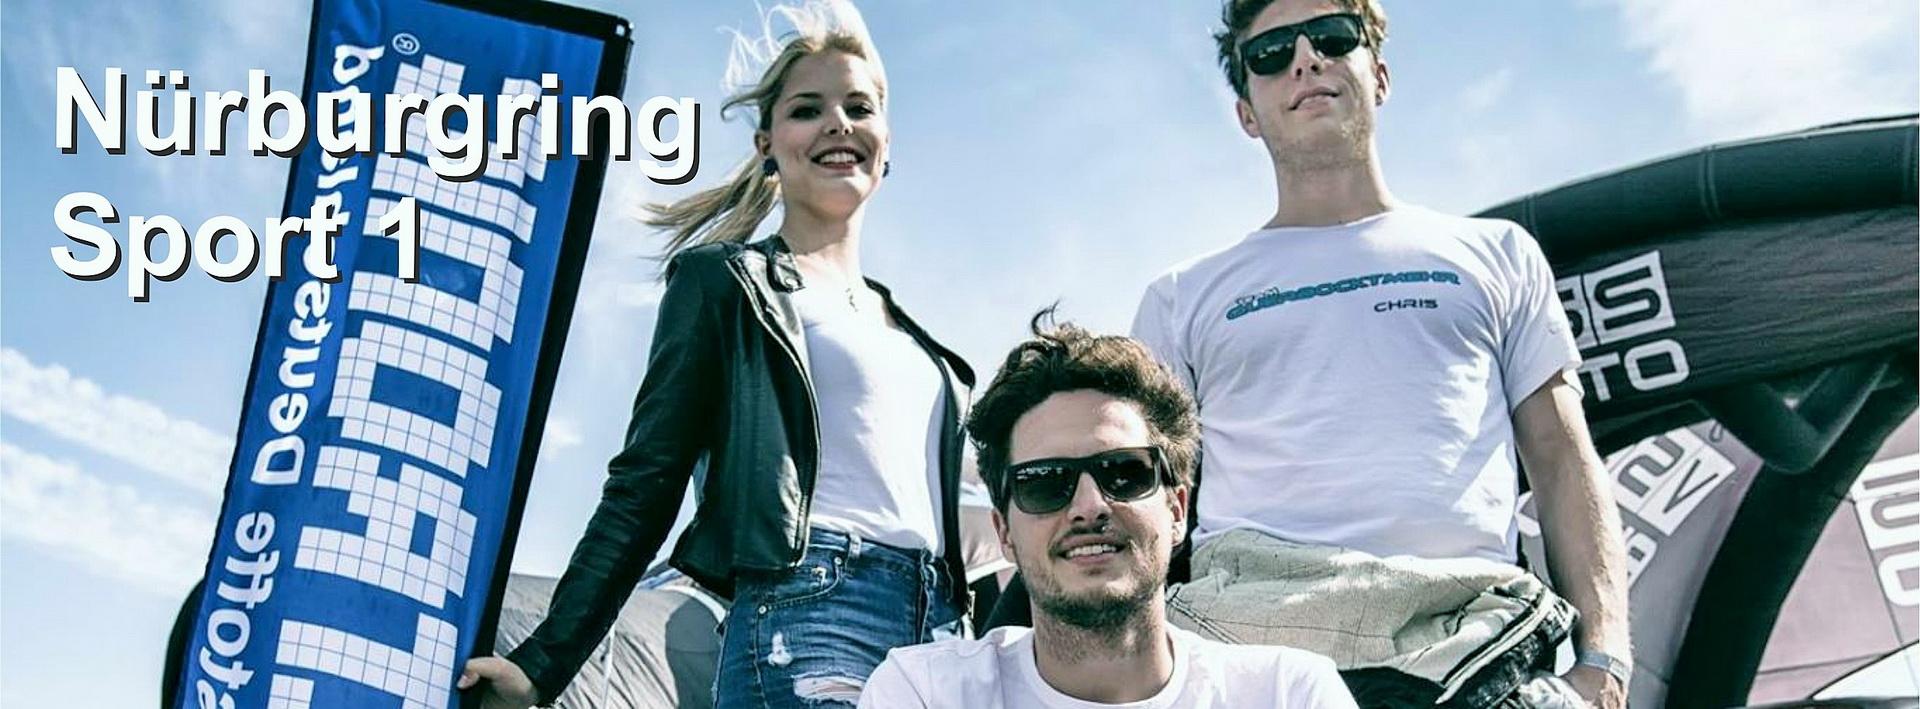 Sport 1 Nürburgring 2015